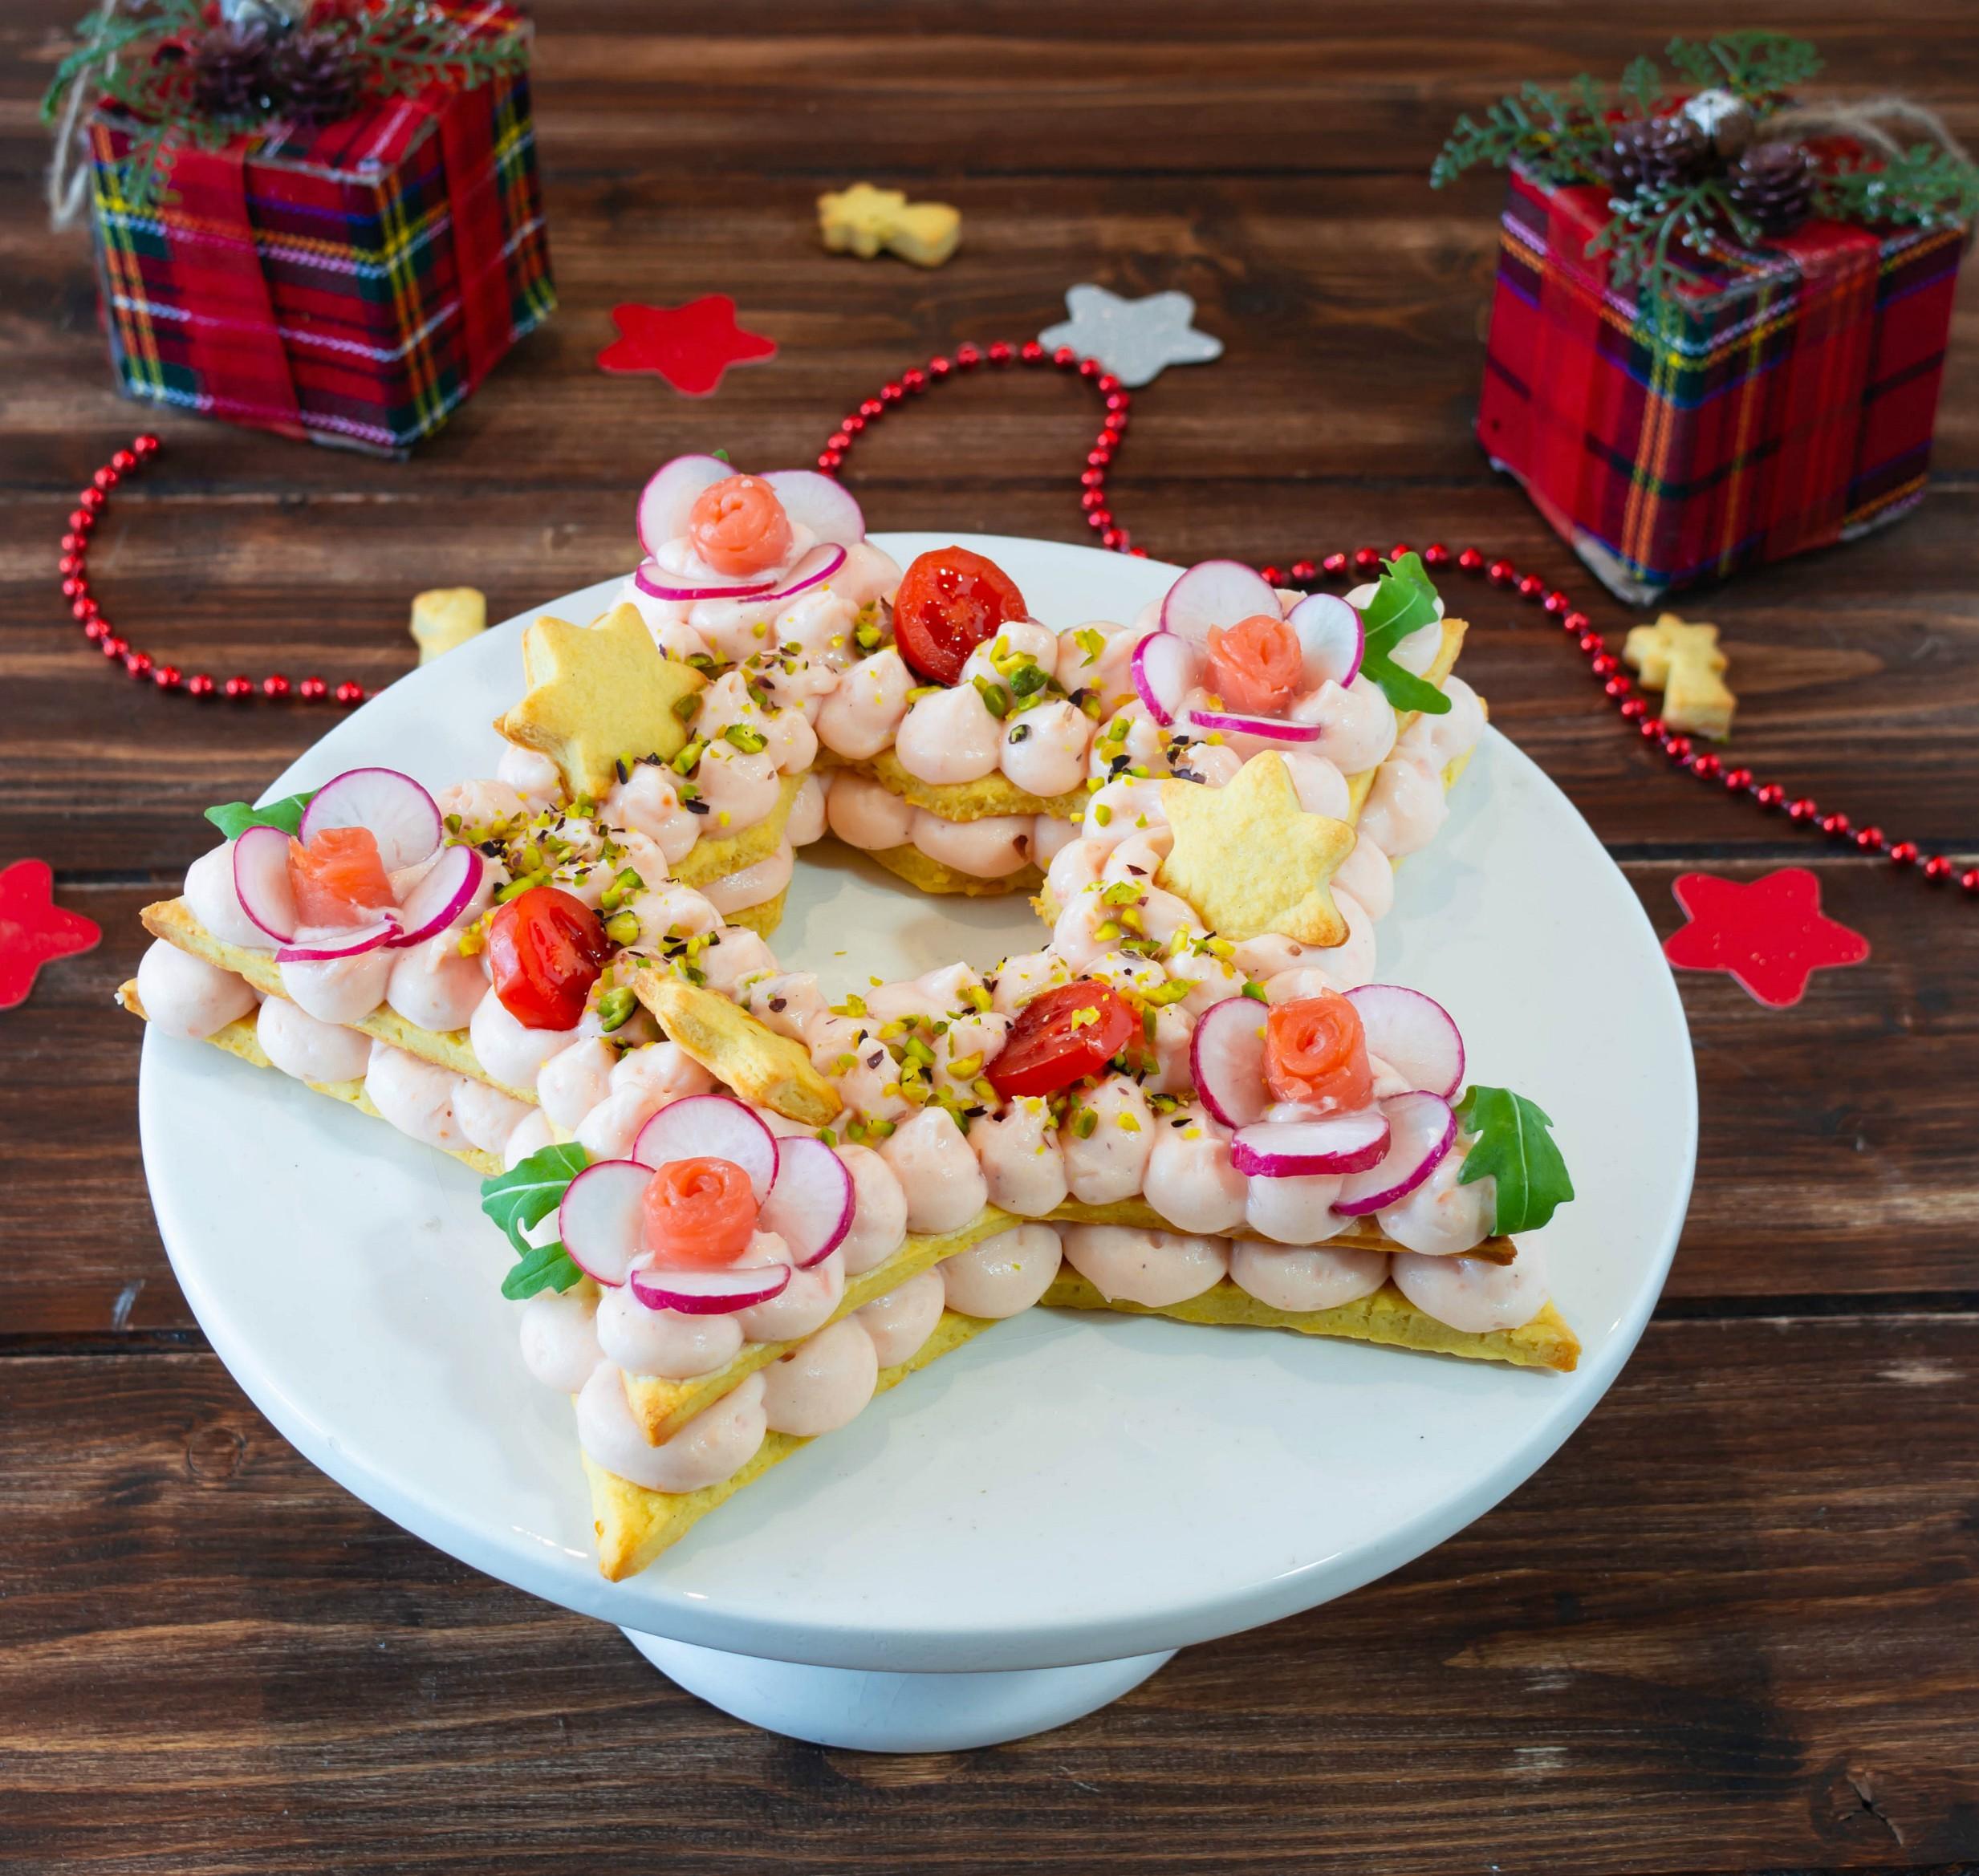 Cream tart salata con mousse al salmone